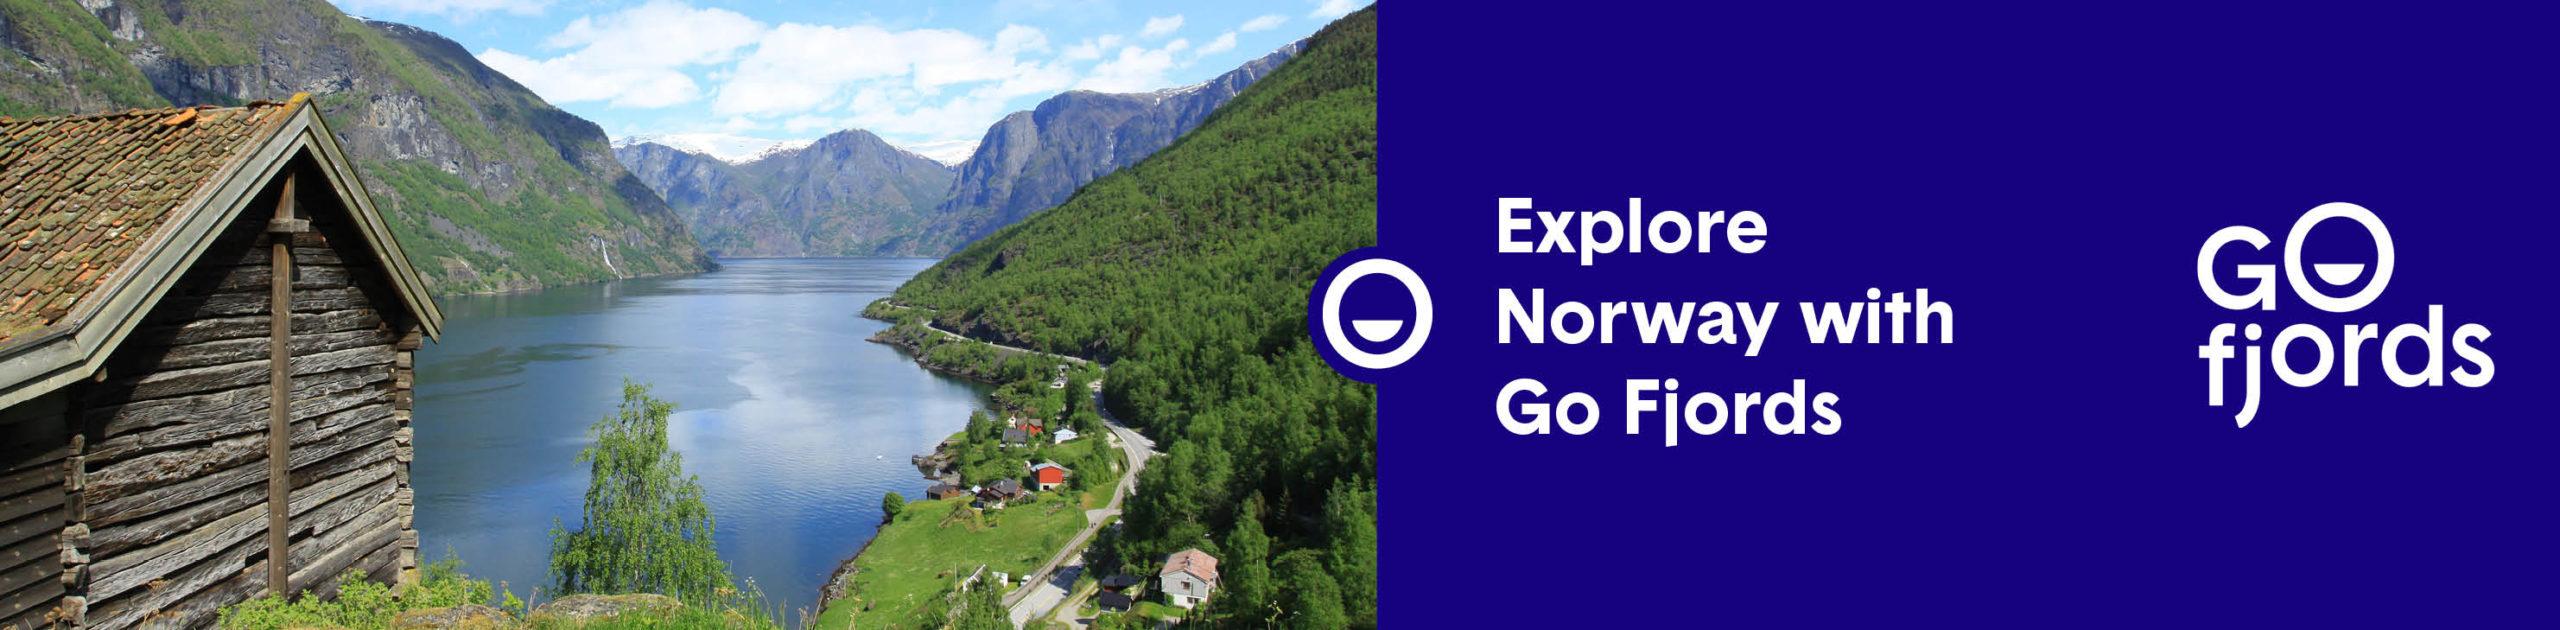 Explore Norway with Go Fjords